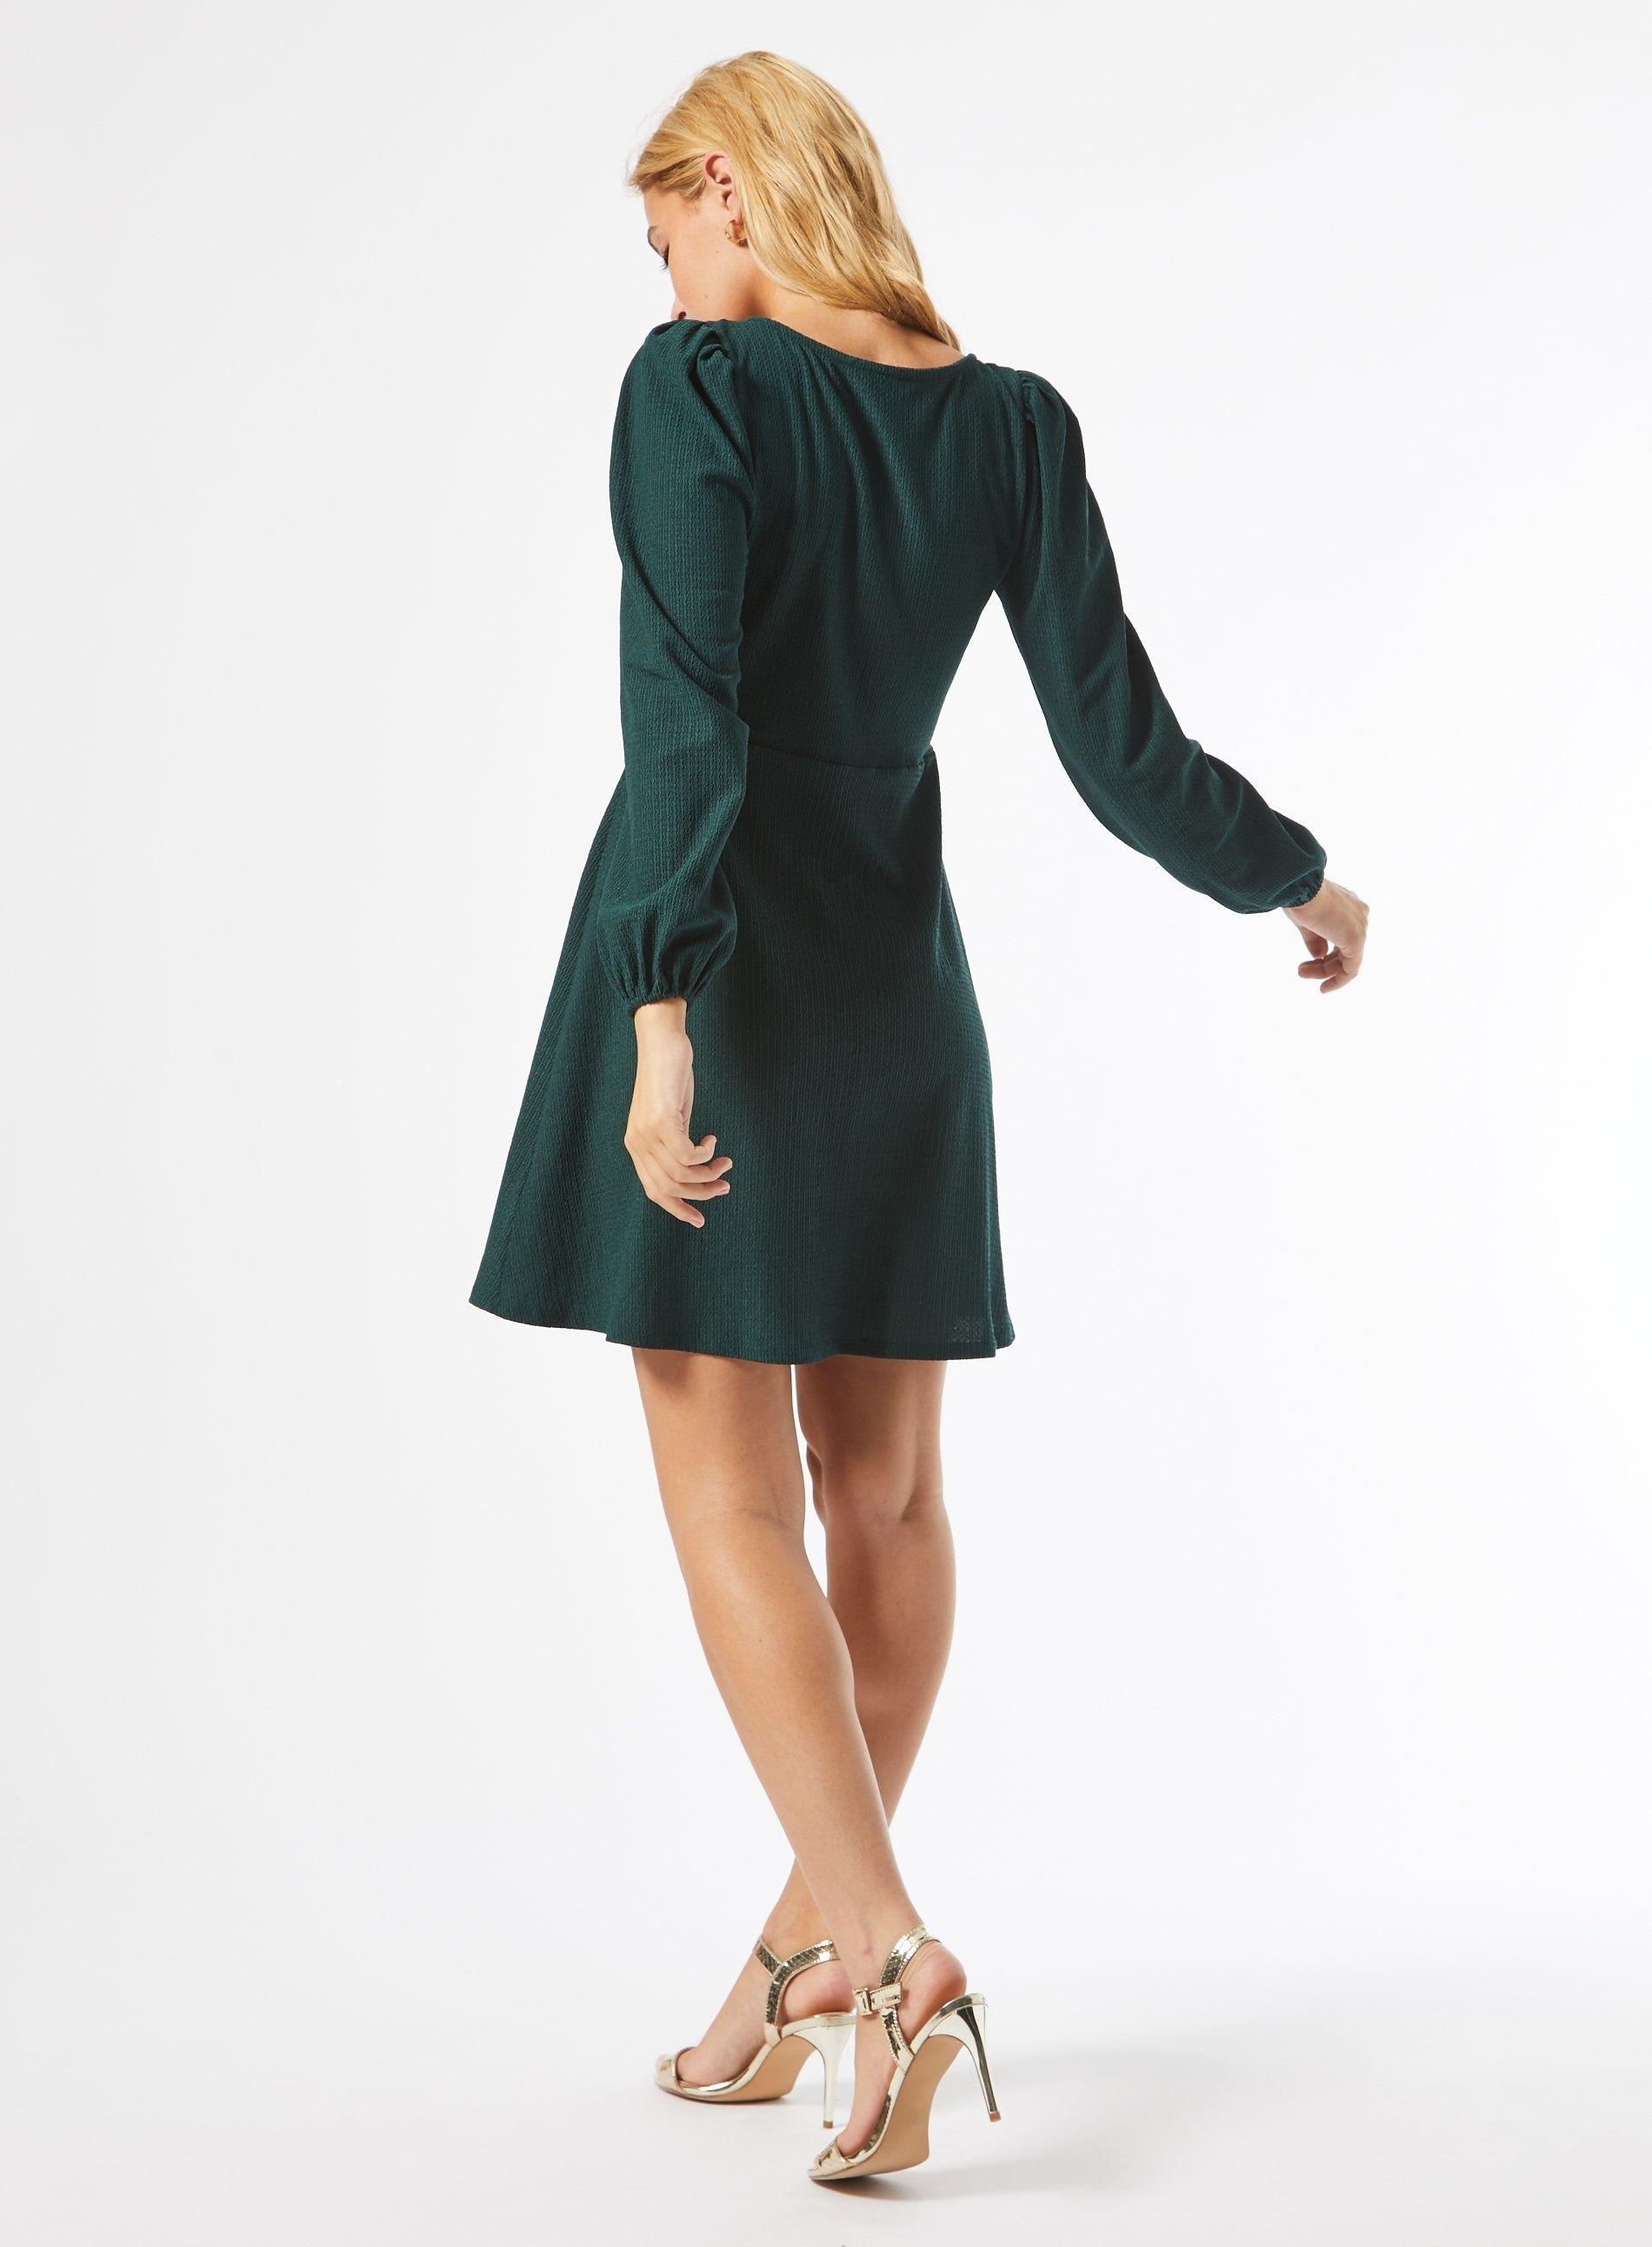 Dorothy Perkins Womens Petite Green Ruched Mini Dress Long Sleeve V-Neck